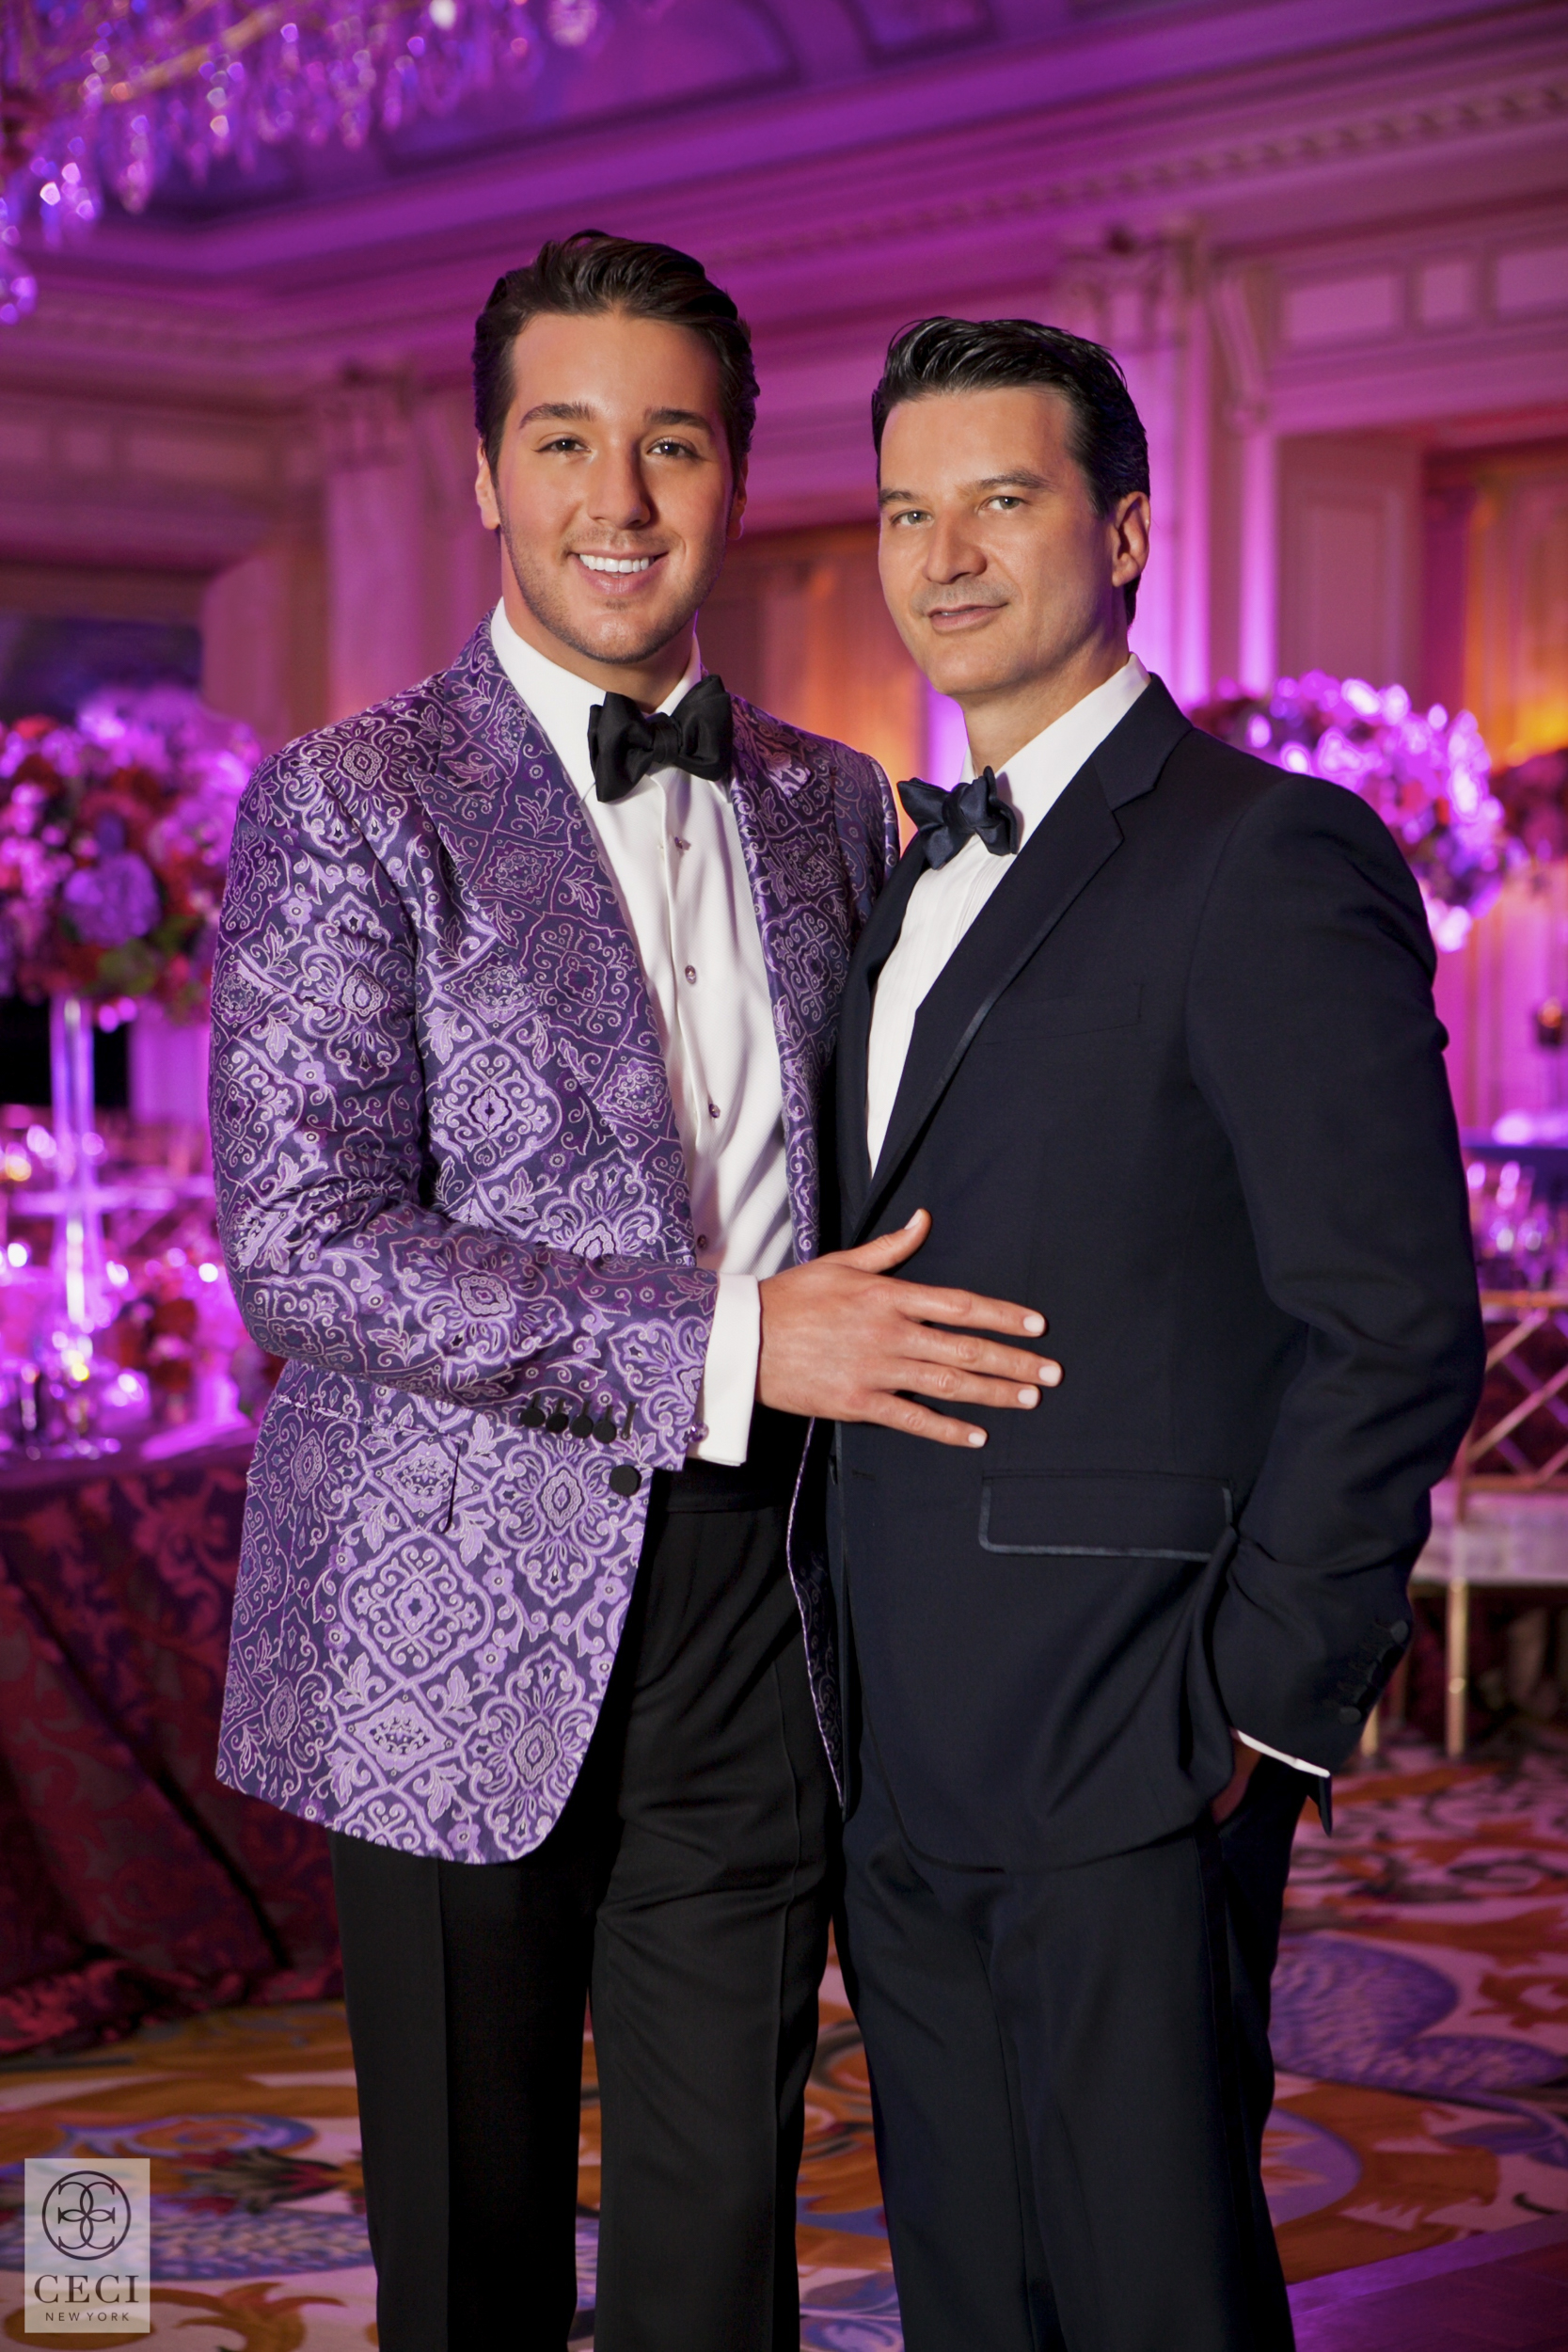 ceci_new_york_lucas_somoza_purple_regal_wediding_birthday_commitment_ceremony_gold-18.jpg